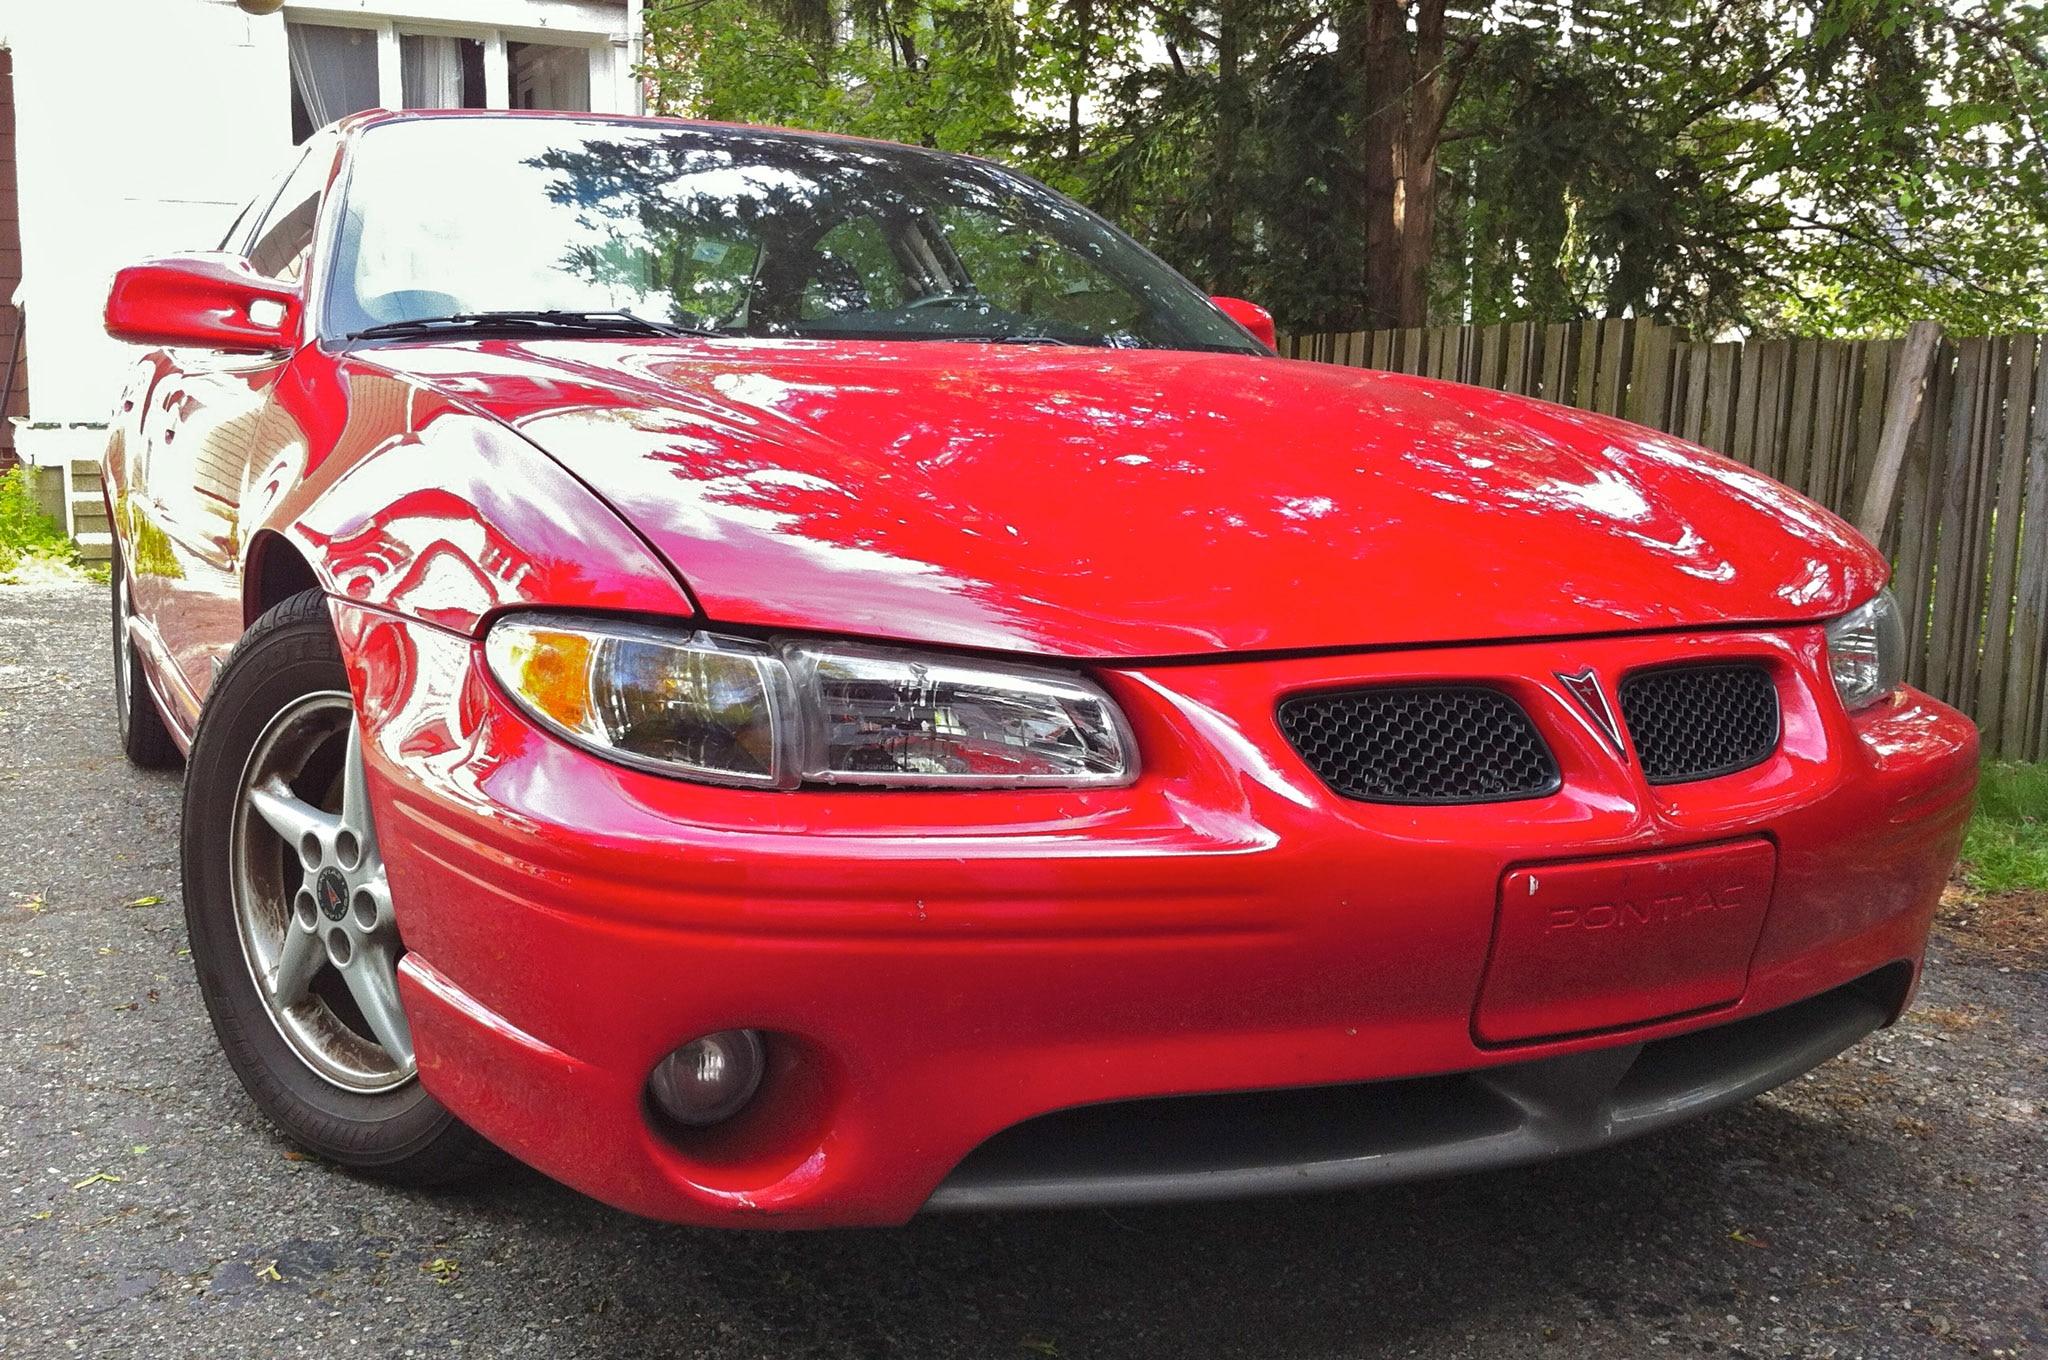 2000 Pontiac Grand Prix Front